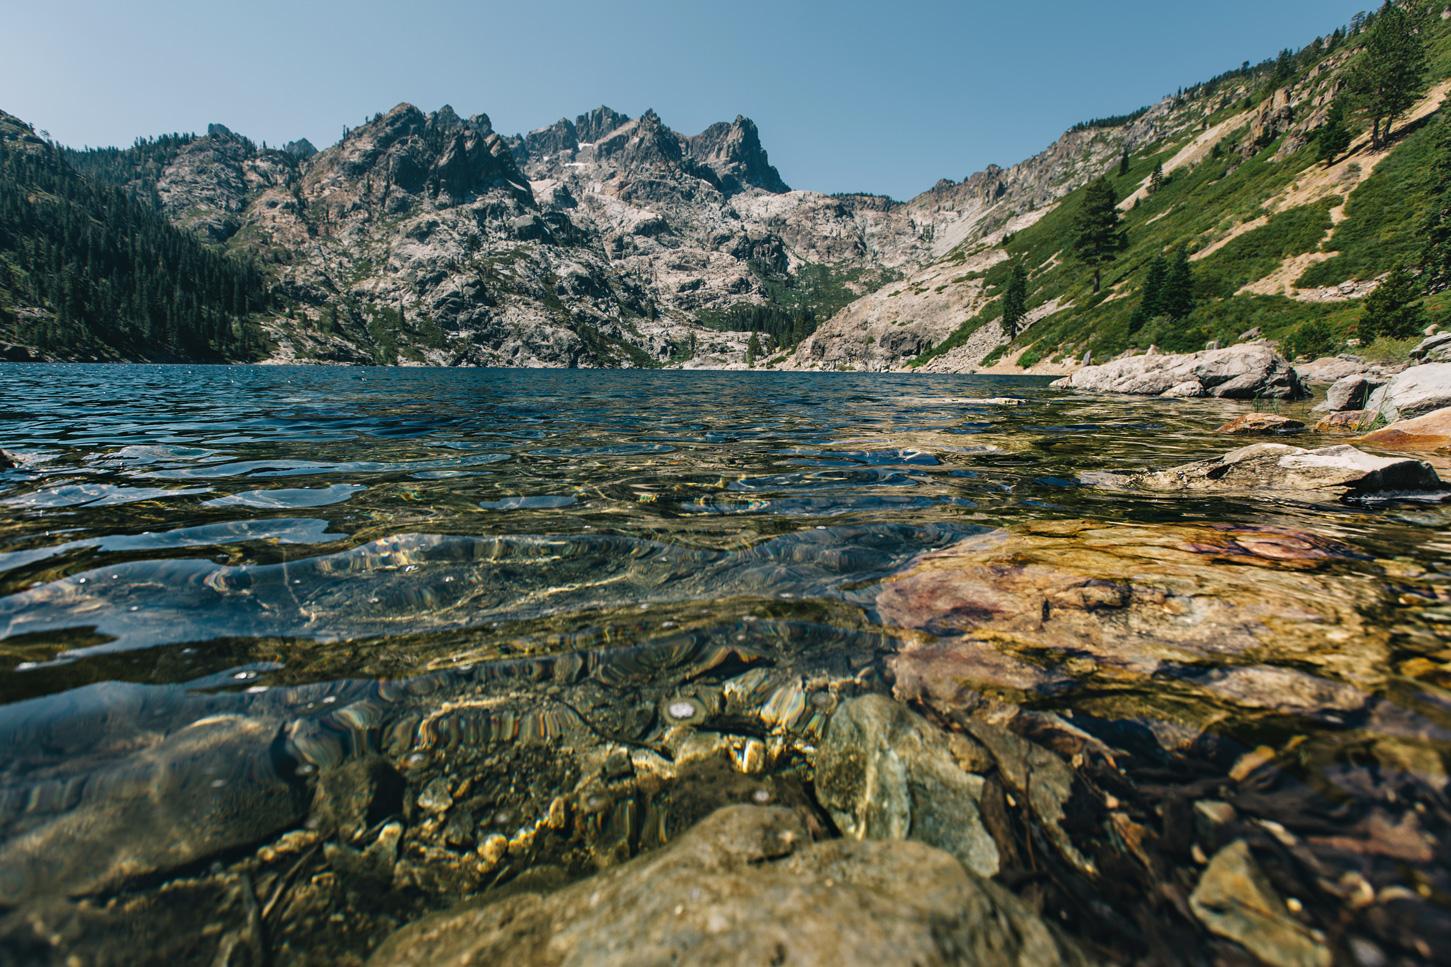 CindyGiovagnoli_outdoors_photographer_Sierra_Buttes_firetower_watchtower_Sardine_Snag_Bear_lake_hike_swim_camp-049.jpg